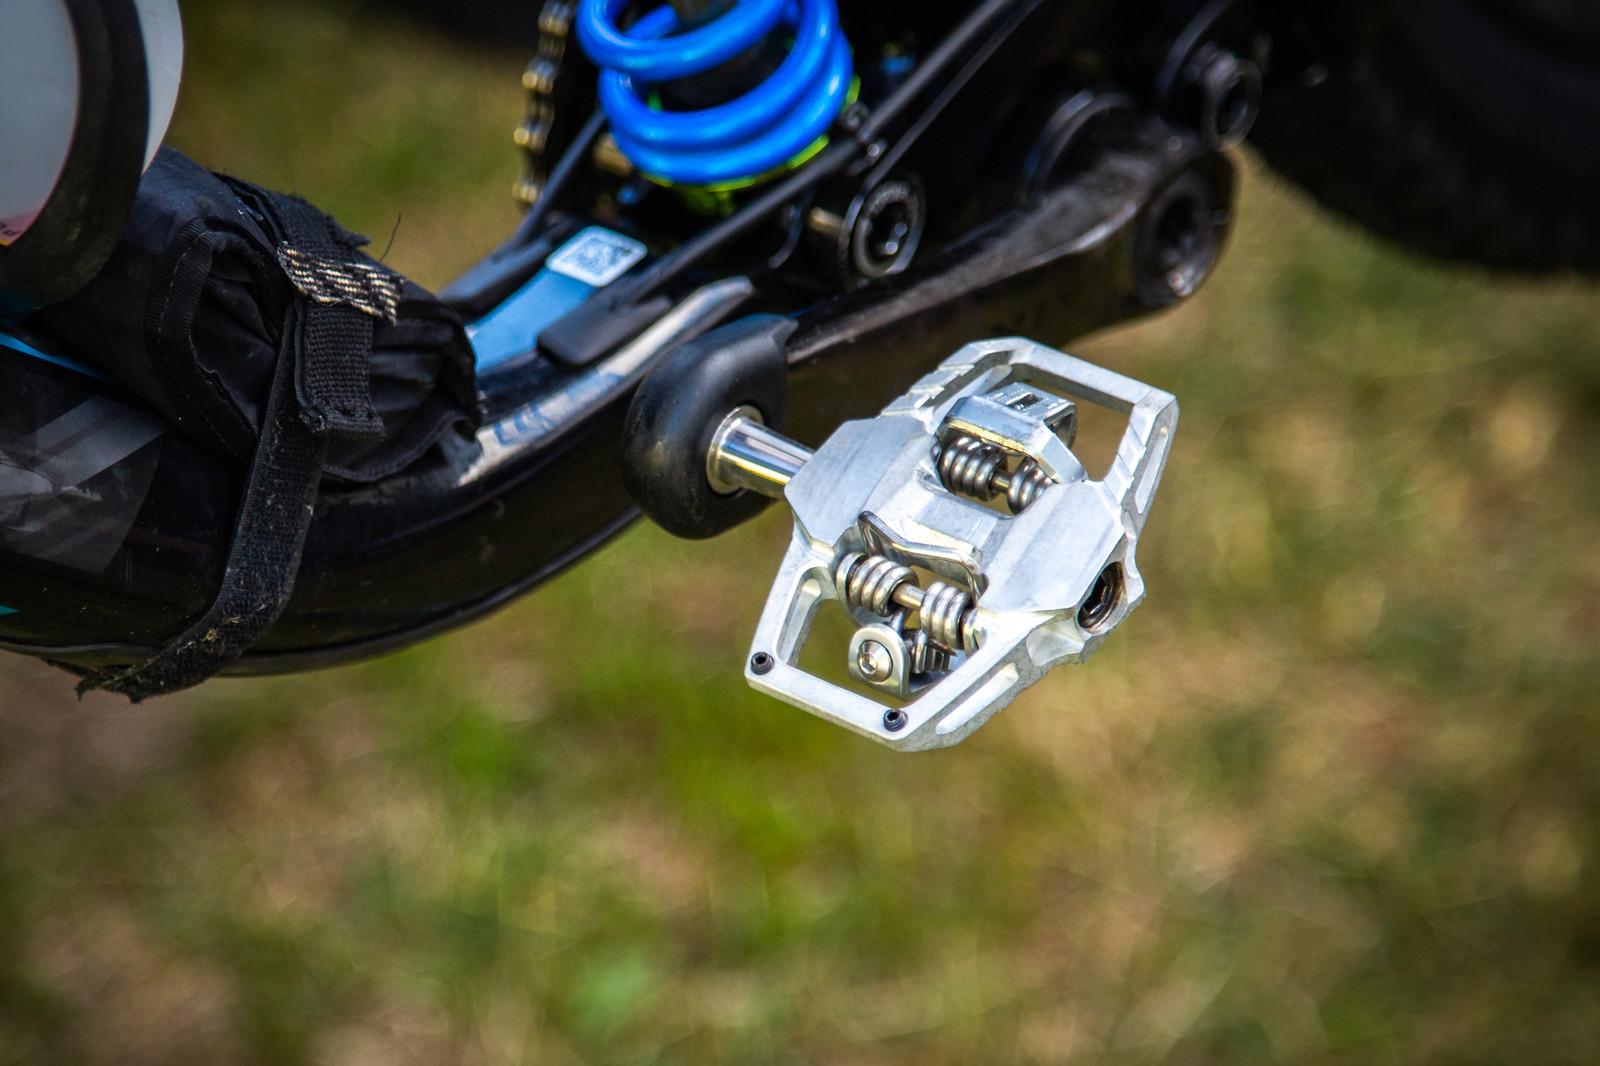 New HT Pedals? - PIT BITS - Enduro World Series, La Thuile - Mountain Biking Pictures - Vital MTB